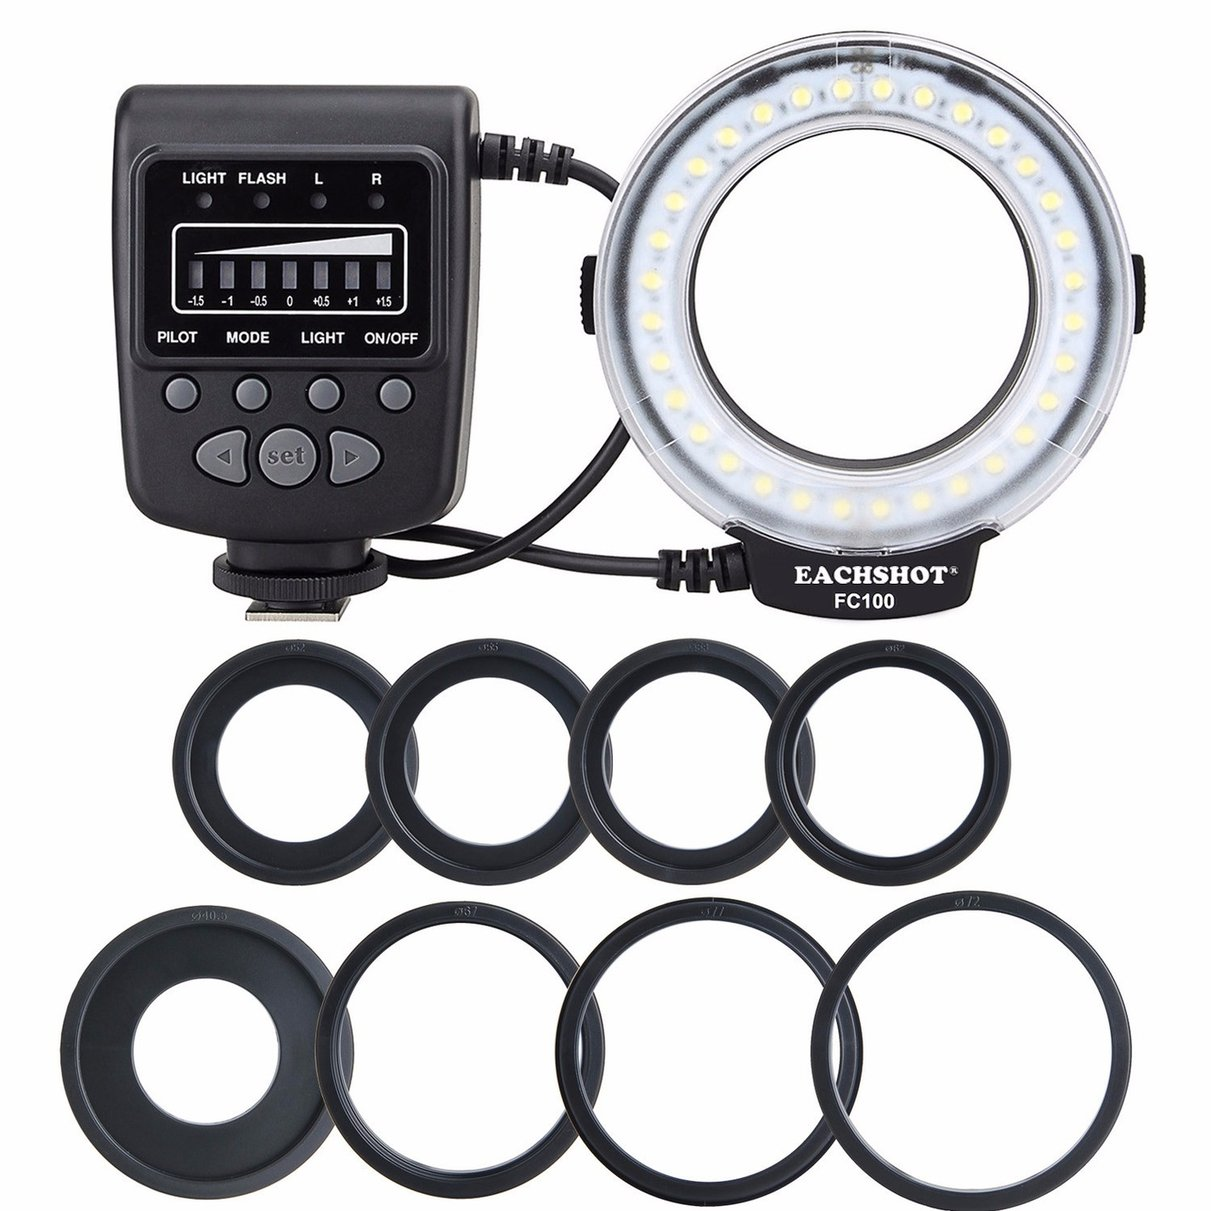 Meike FC-FC100 Macro Ring Flash/Luce MK FC 100 per Canon per EOS 650D 600D 60D 7D 550D 1100D T3i T5i T4i T3